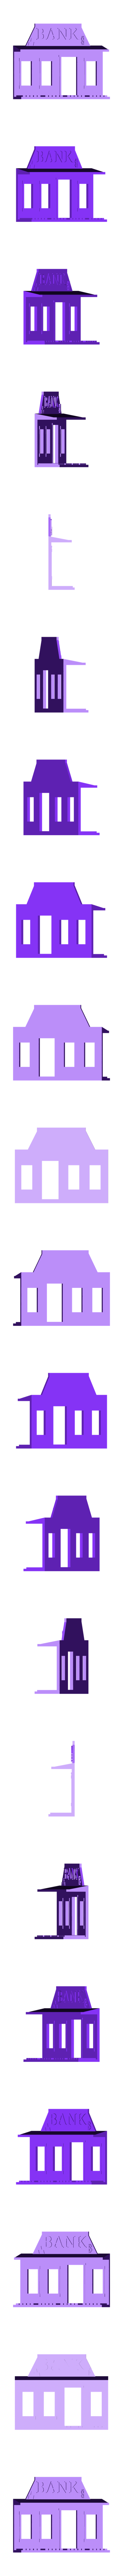 WT_Bank.stl Download free STL file Western Town • 3D print model, mrhers2